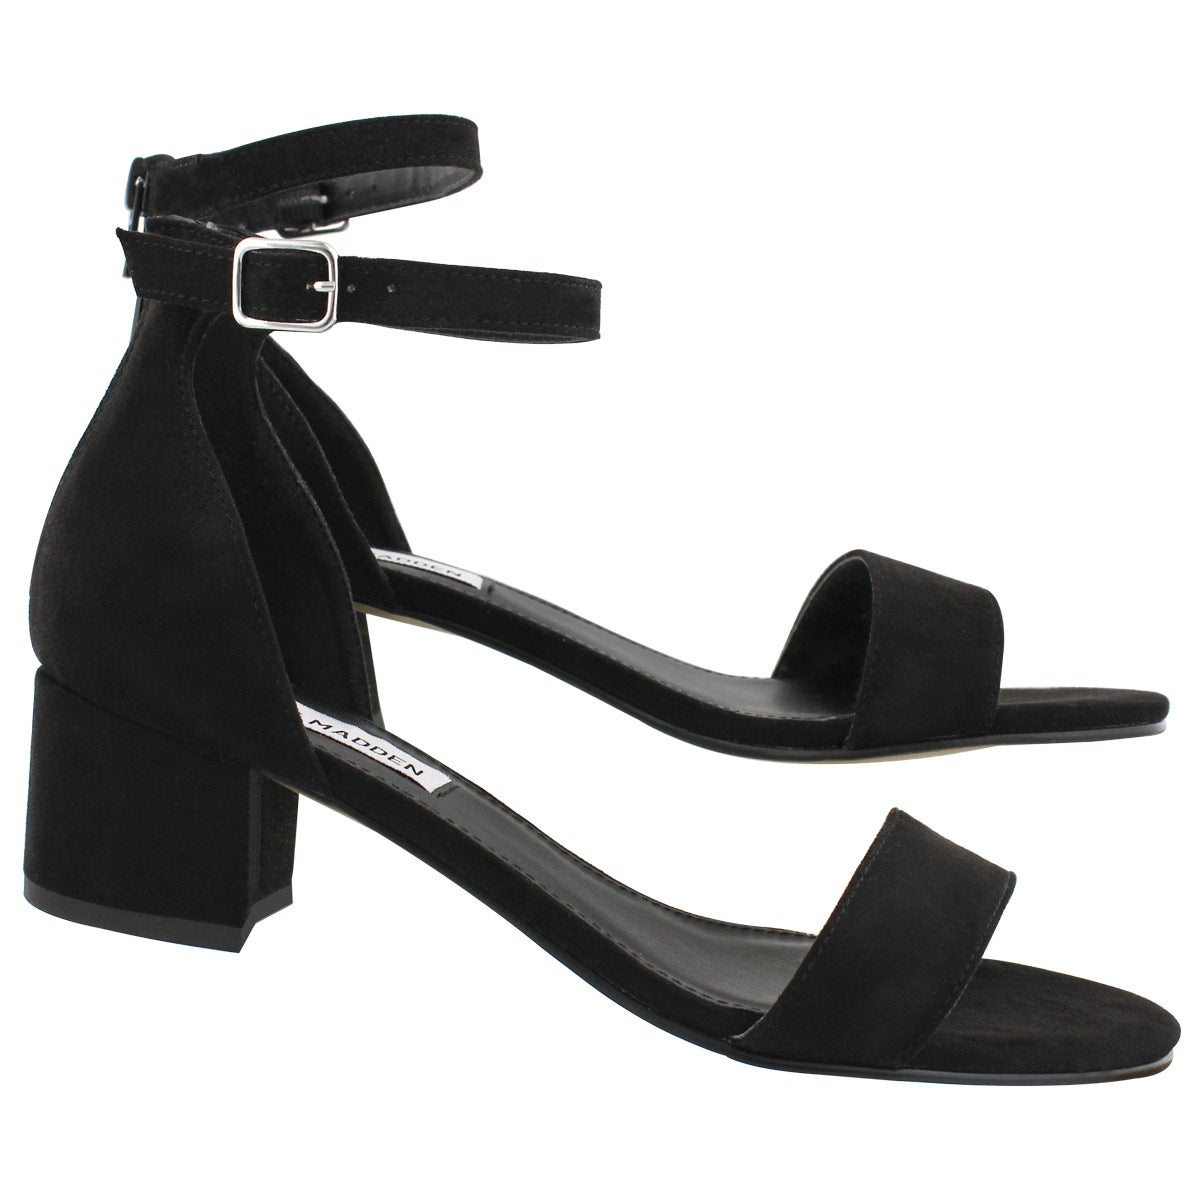 Lds Fabiana black ankle strap dress sndl